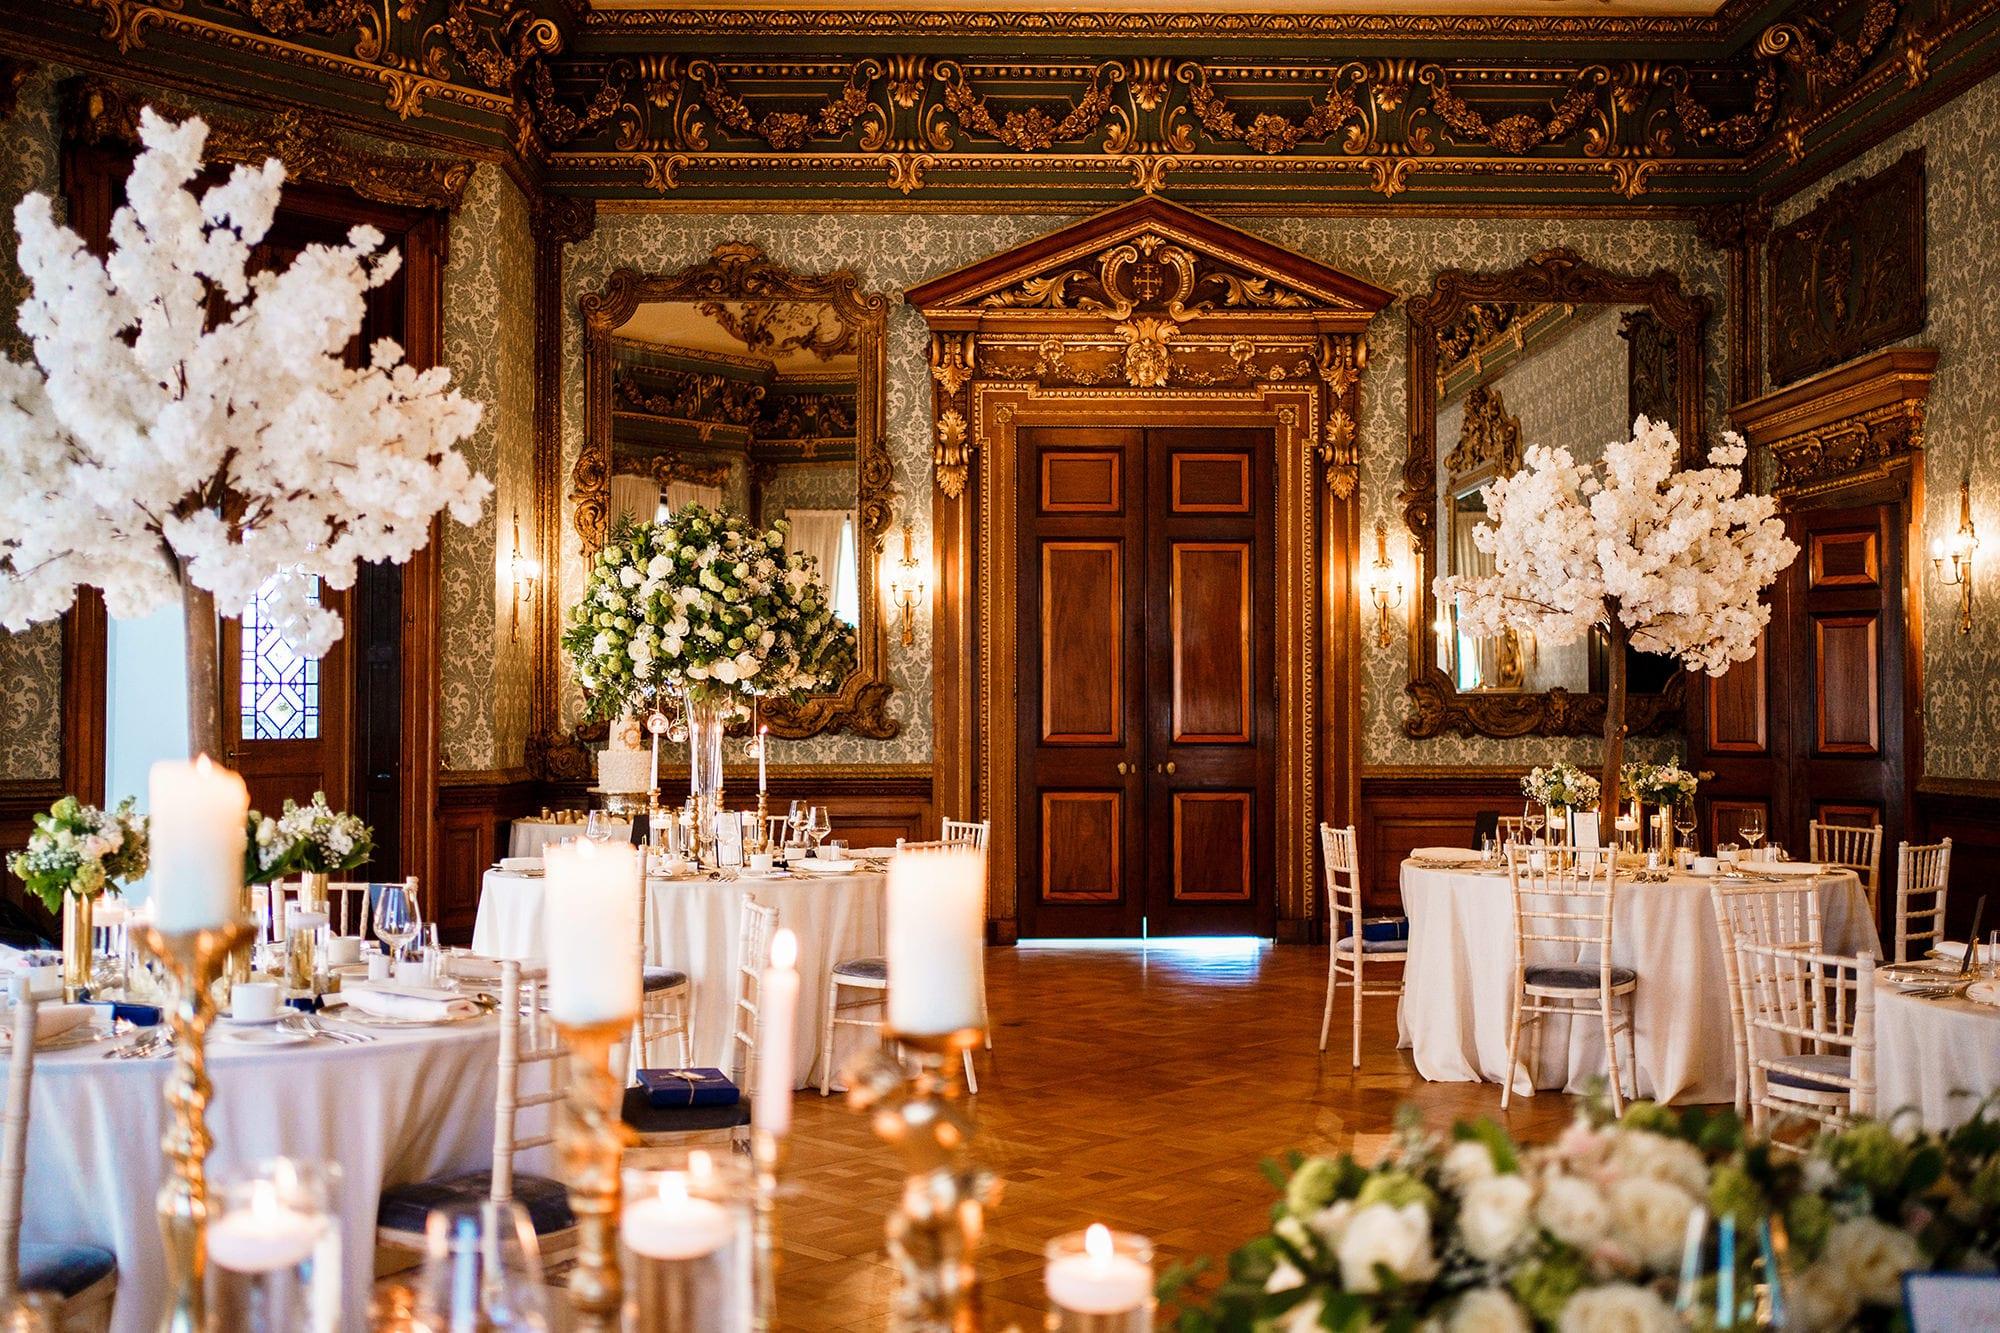 Hawkstone Hall Wedding Reception